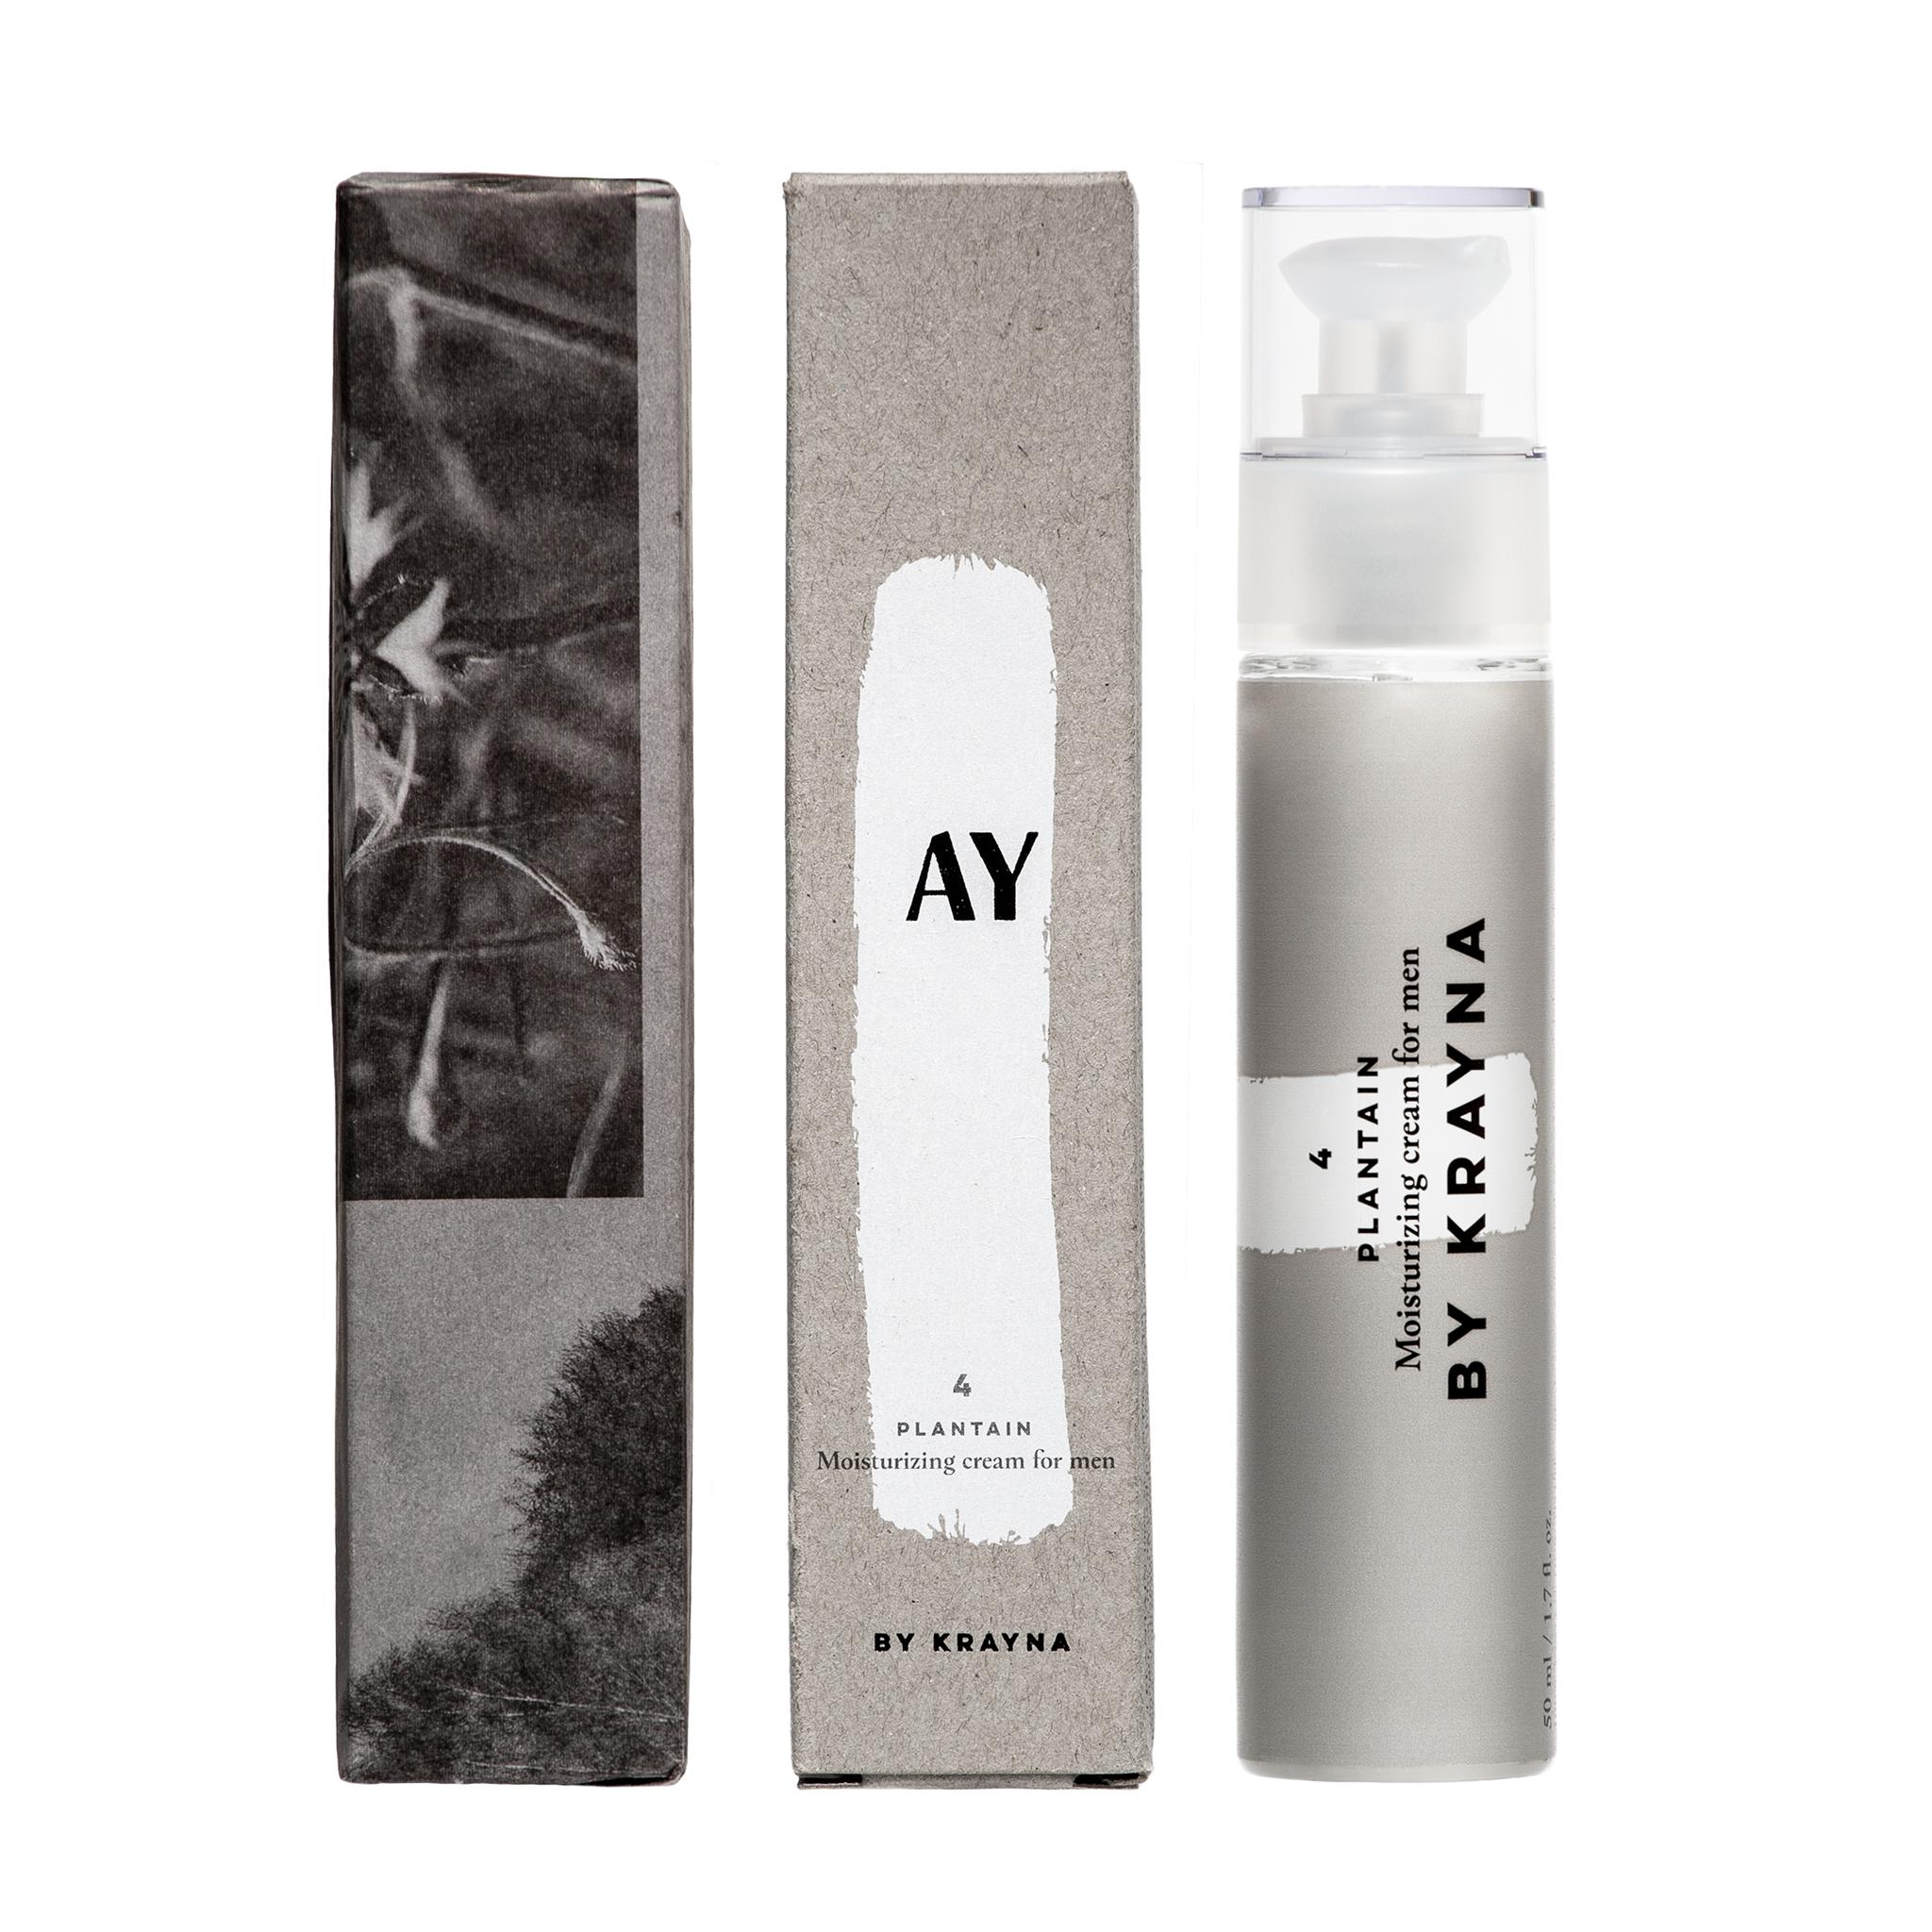 KRAYNA AY 4 Broadleaf Plantain Cream-SoBio-Beauty-Boutique 2